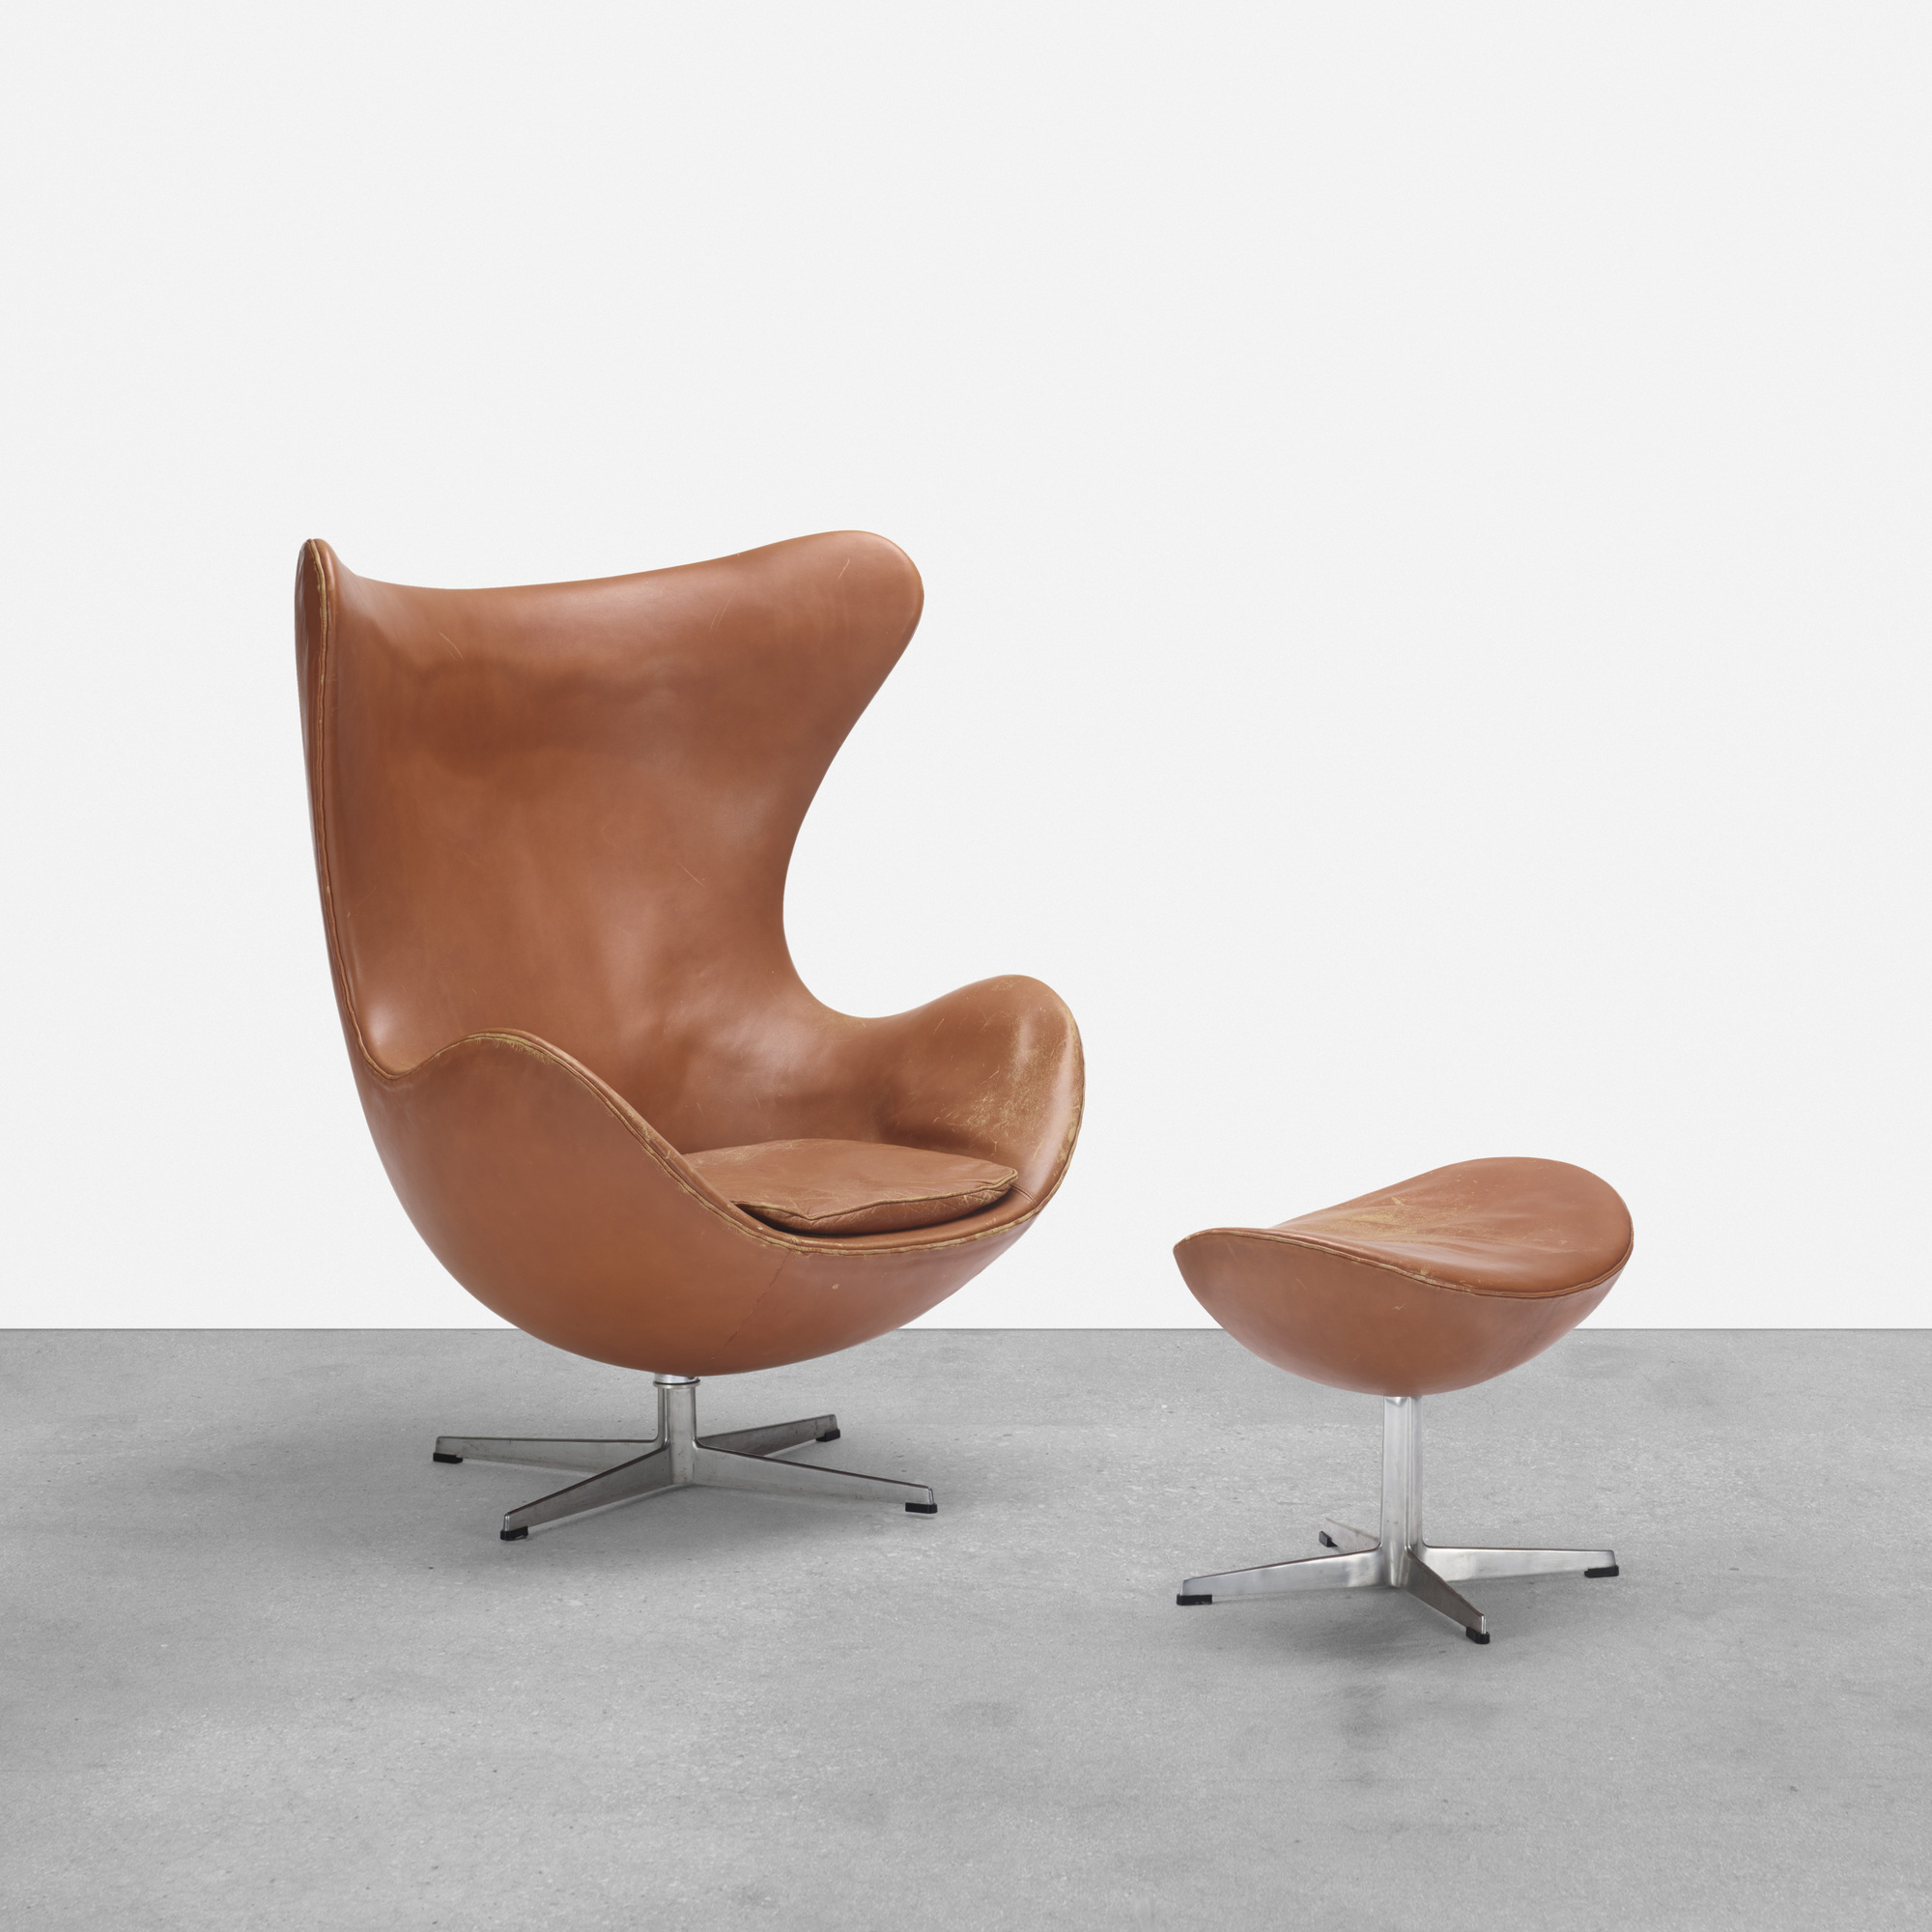 Beau 163: Arne Jacobsen / Egg Chair And Ottoman (1 Of 3)